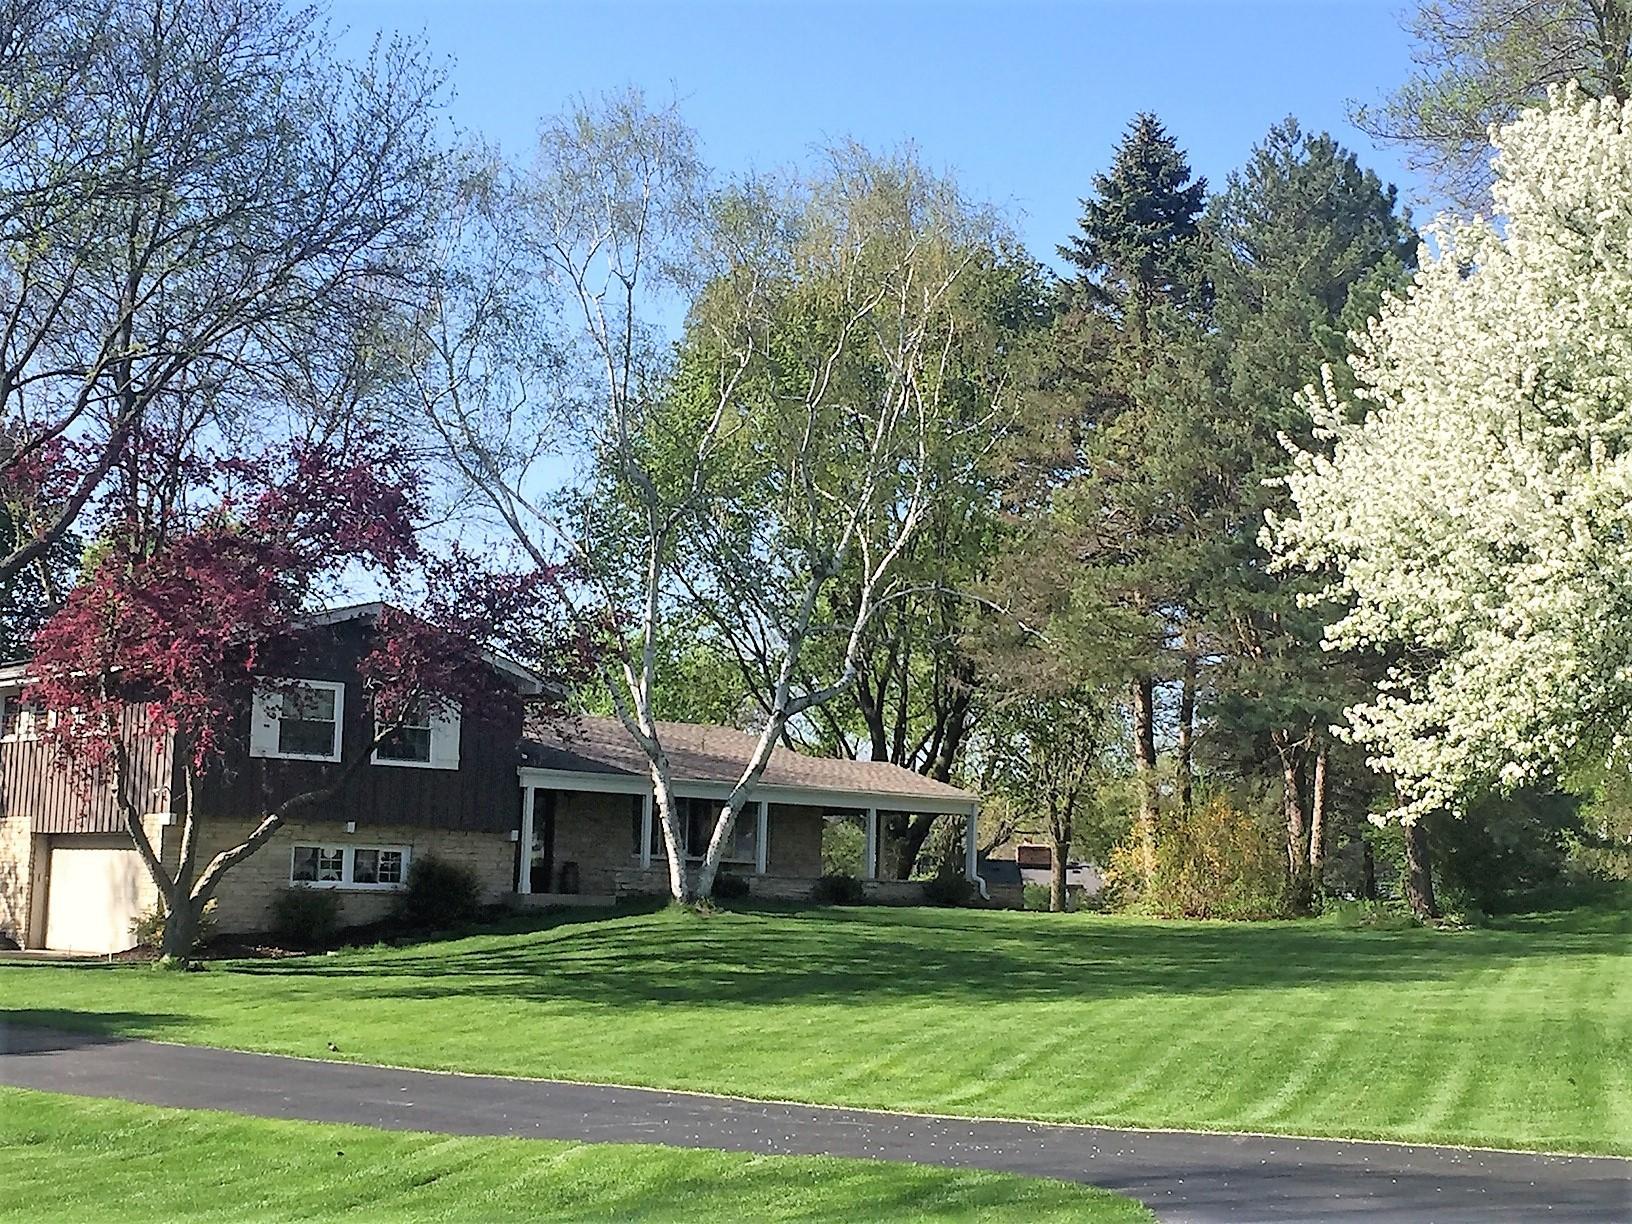 S23W26238 Canterbury Ln, Waukesha, Wisconsin 53188, 4 Bedrooms Bedrooms, ,2 BathroomsBathrooms,Single-Family,For Sale,Canterbury Ln,1625656